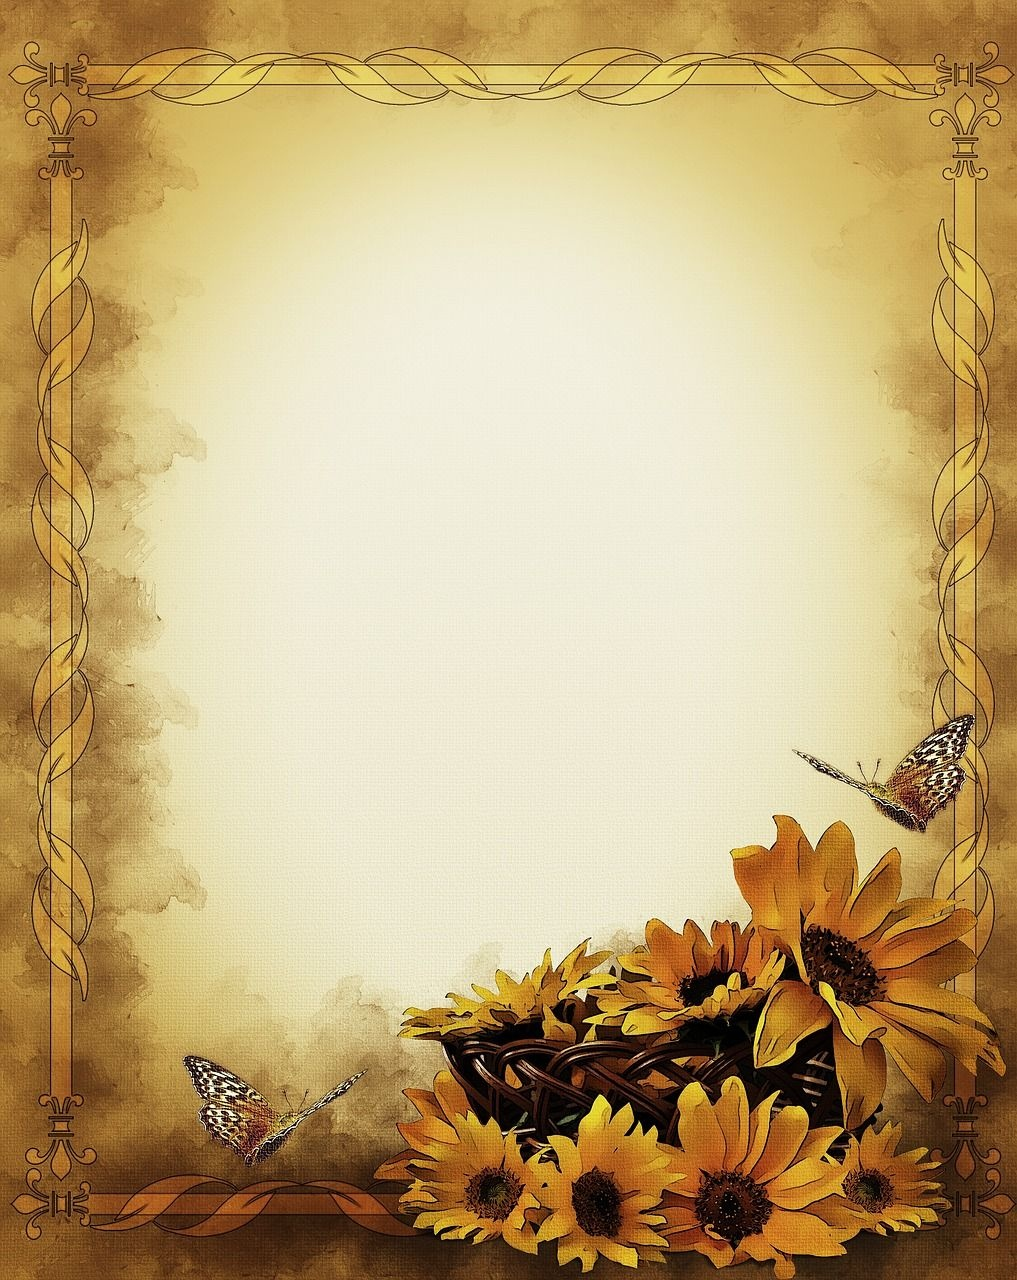 Free Image On Pixabay - Sunflowers, Still Life, Frame | Bridal - Free Printable Sunflower Stationery